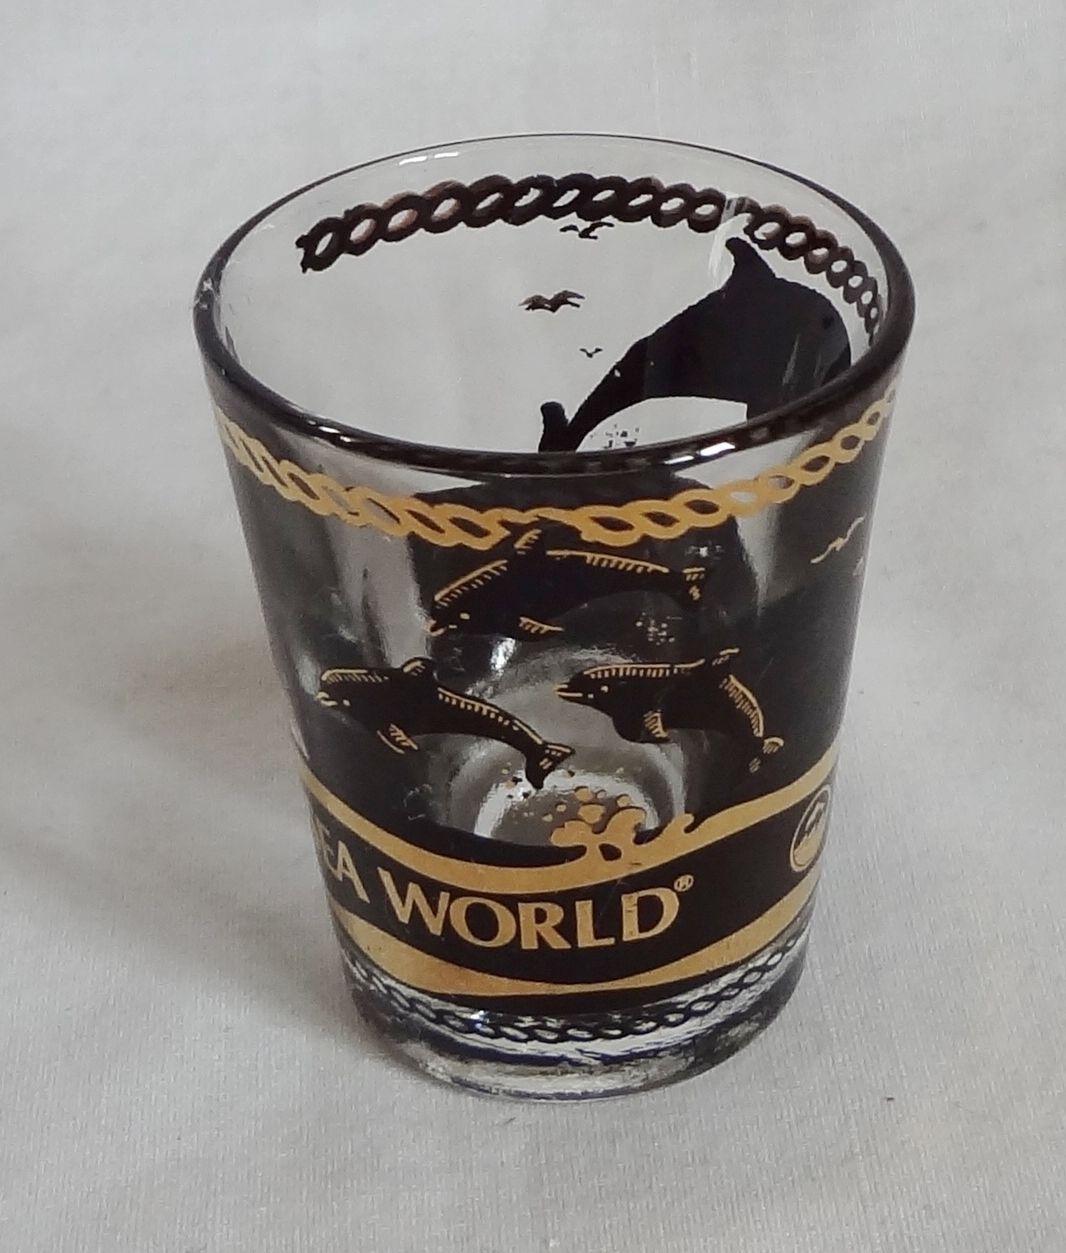 Sea World Orca Killer Whale Dolphin Porpoise 1 oz Shot Glass Barware Souvenir